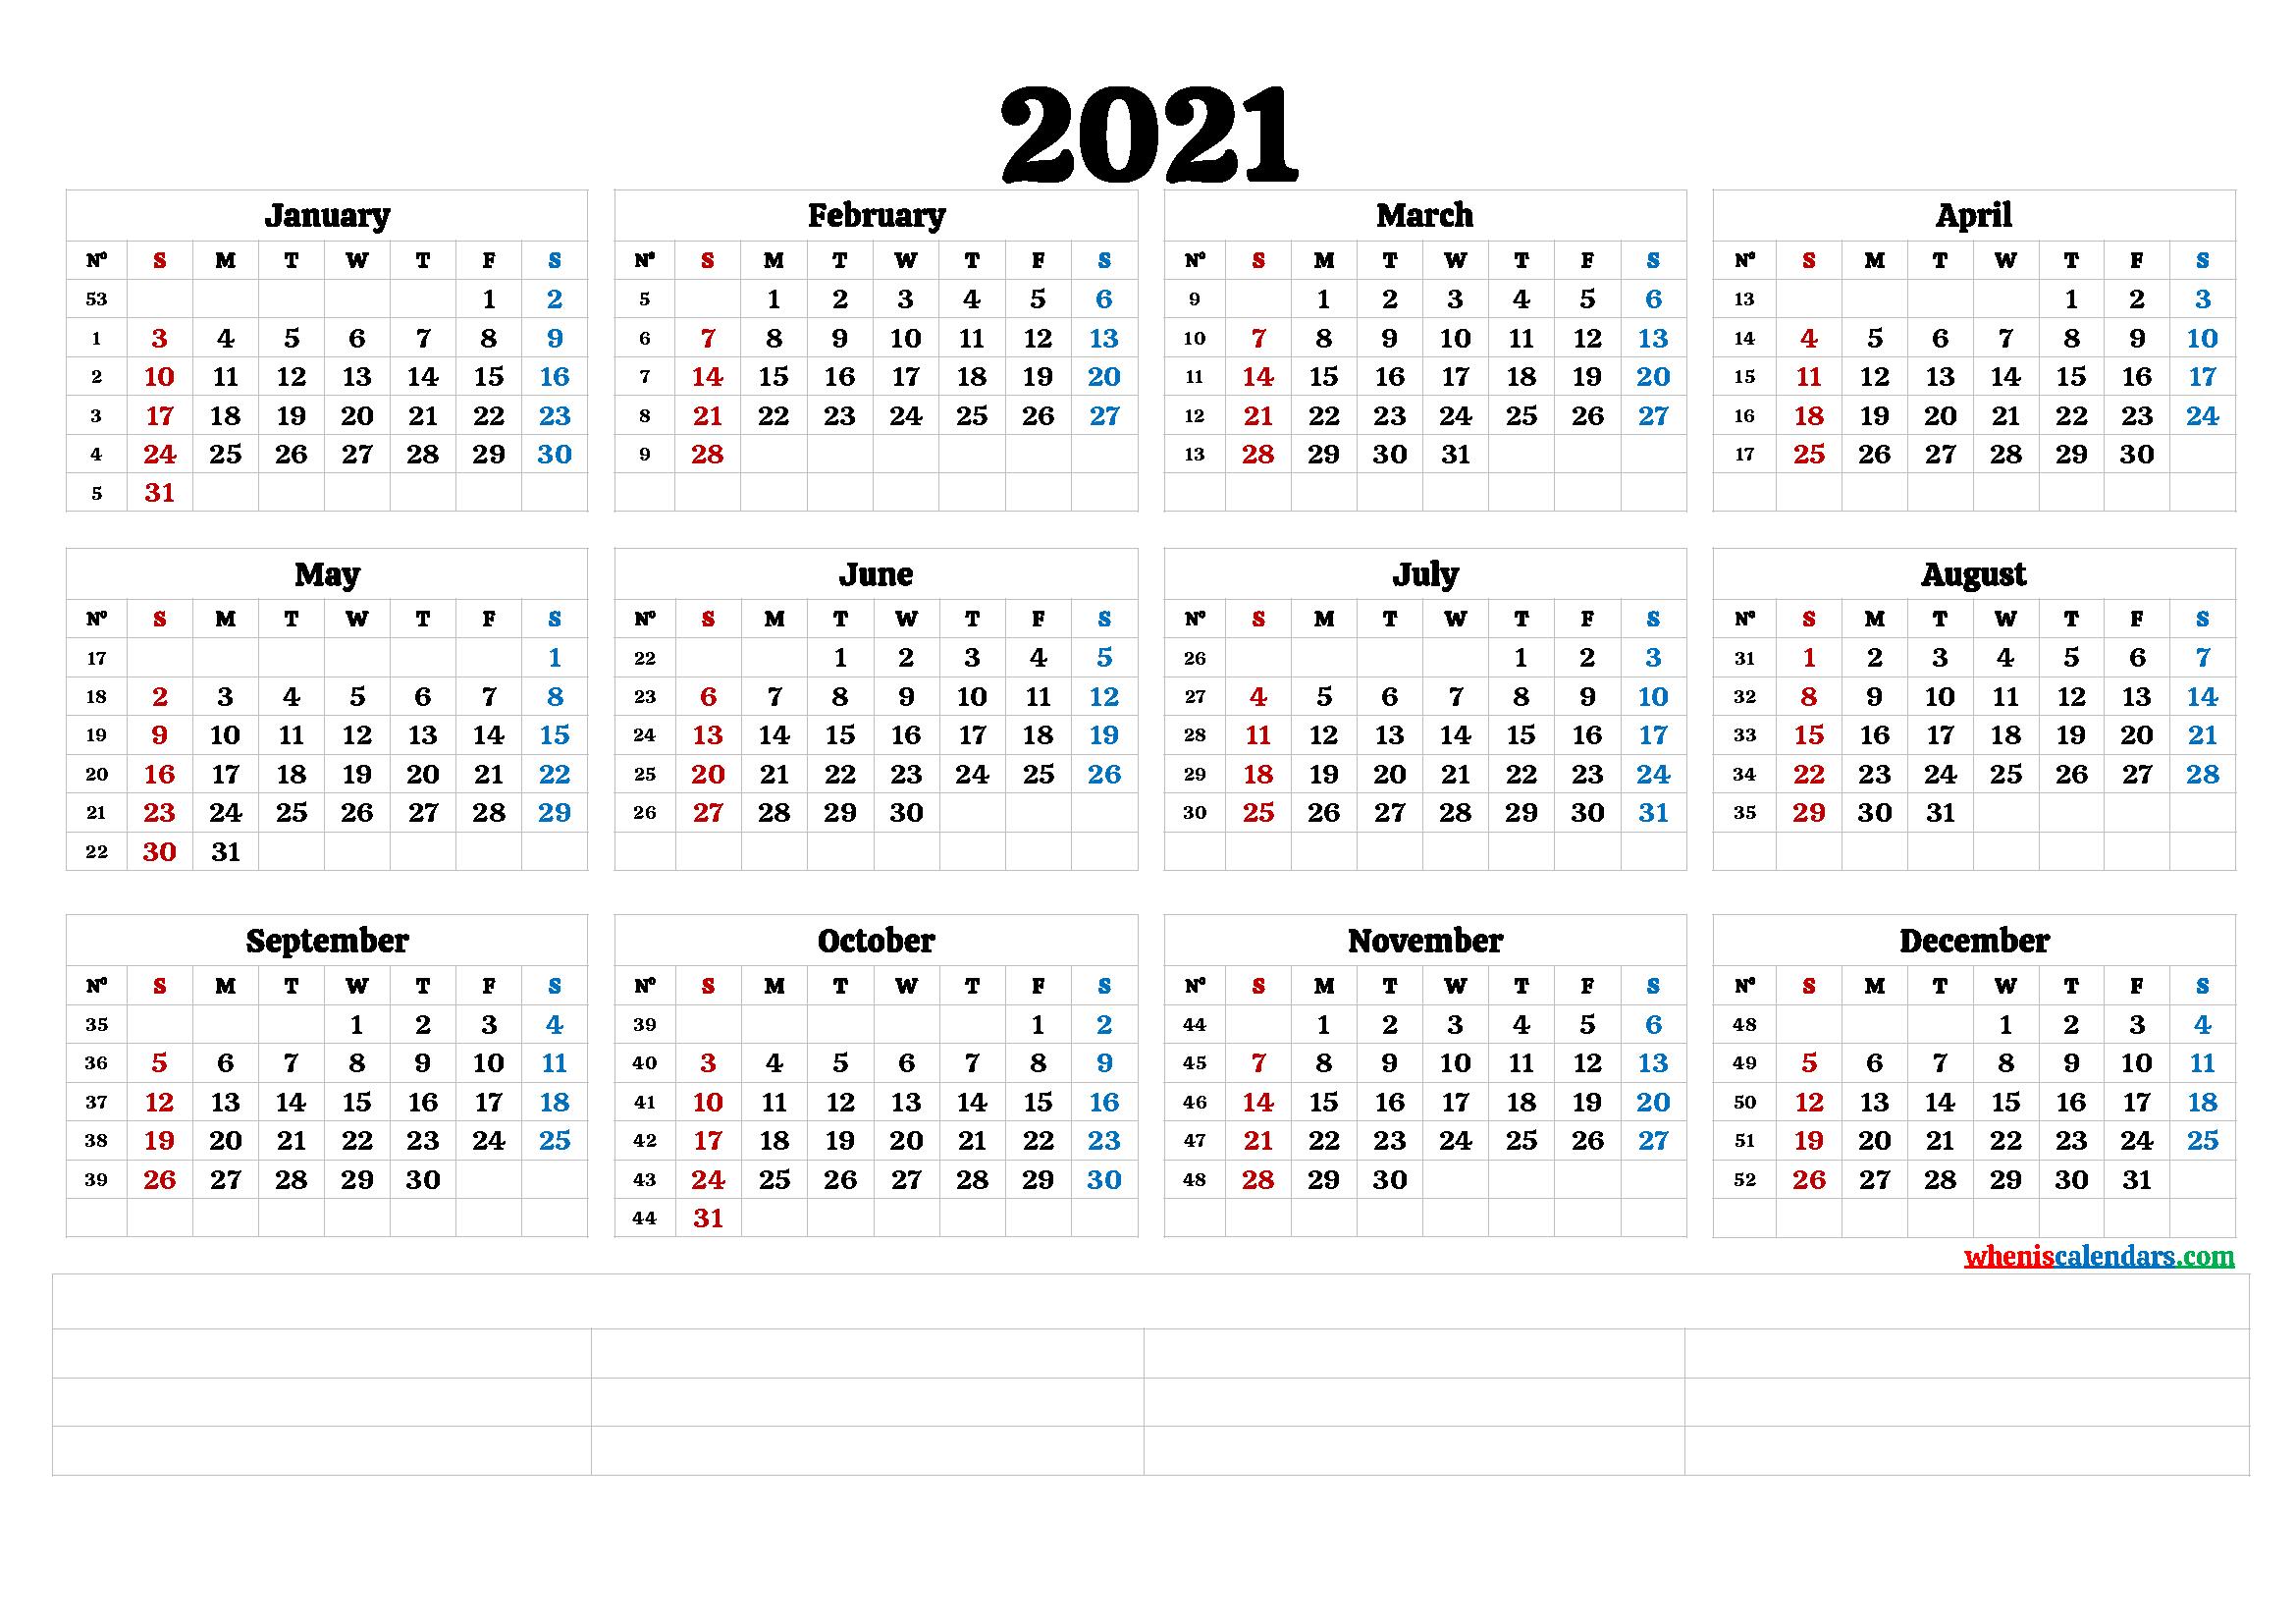 2021 Annual Calendar Printable 6 Templates Free 1